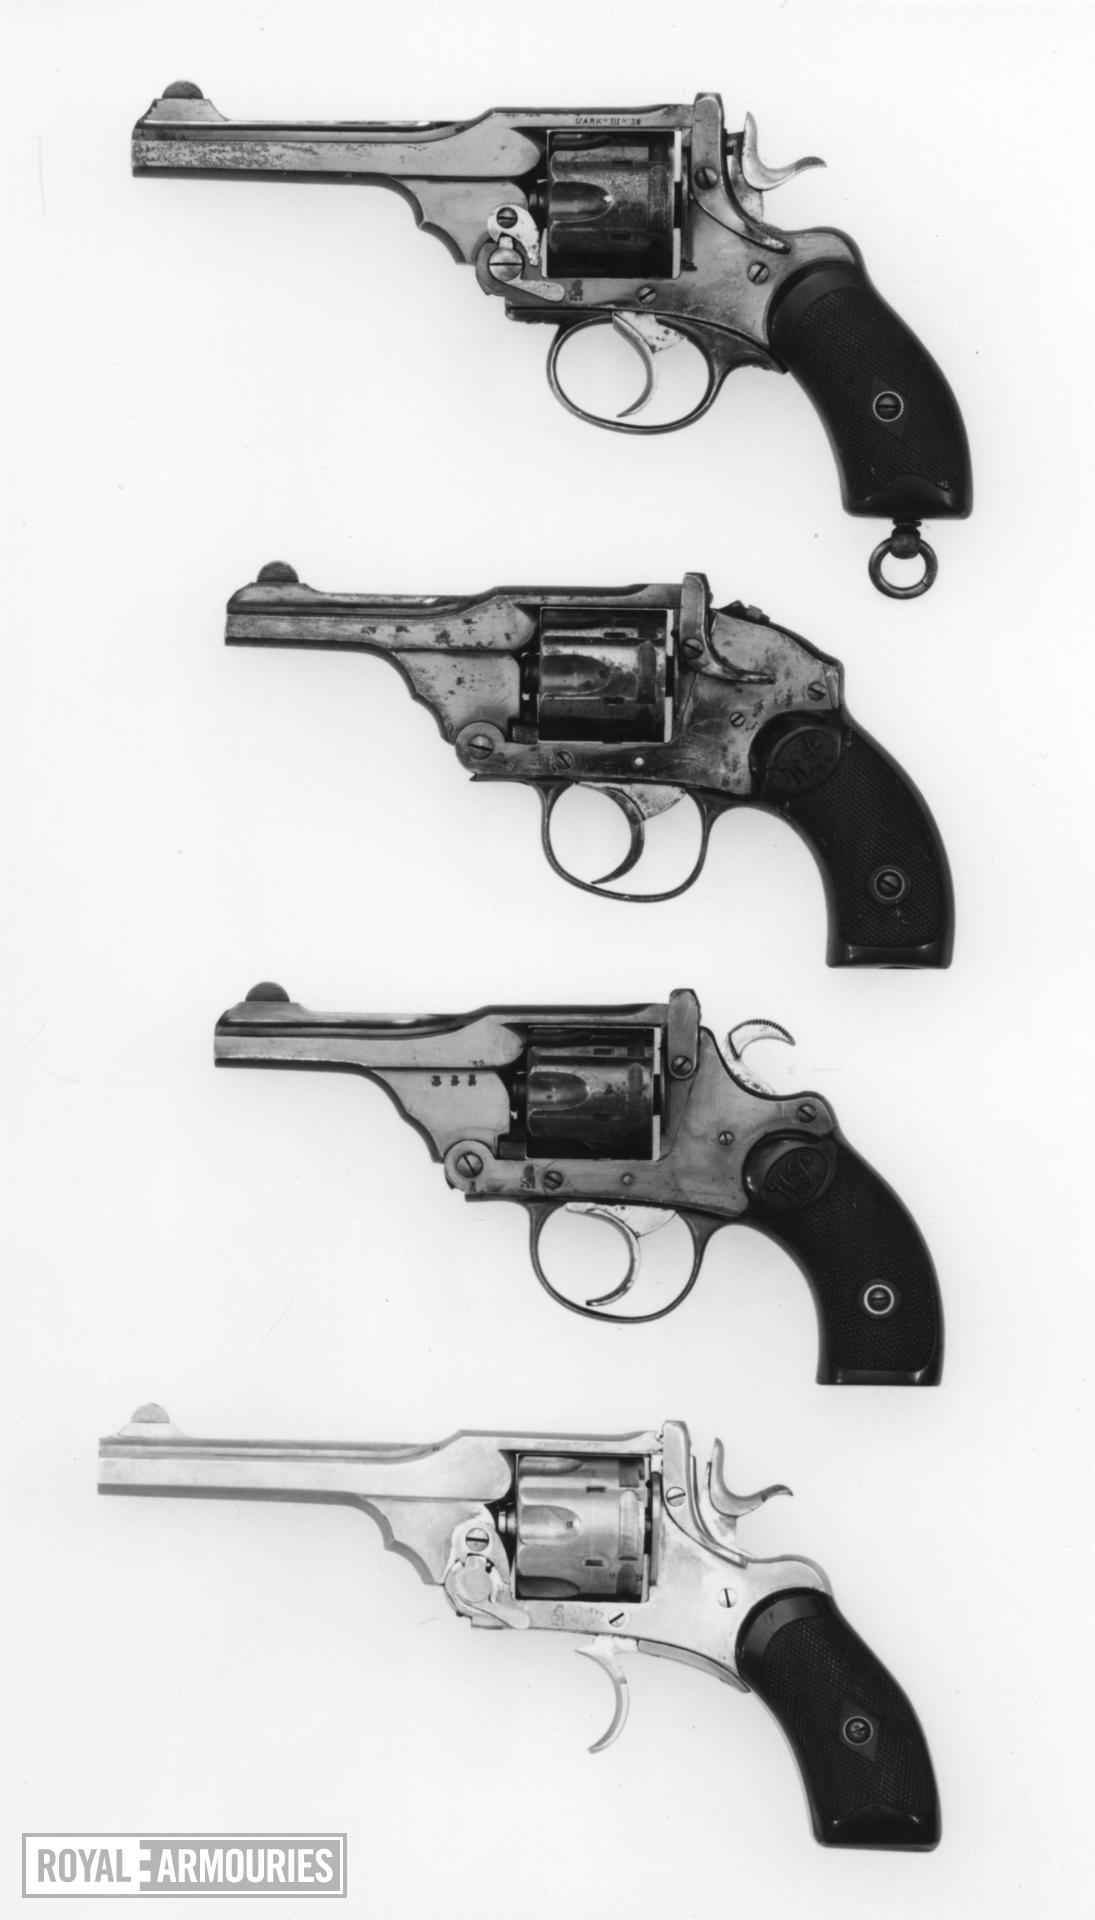 Centrefire six-shot revolver - Webley Mk.II